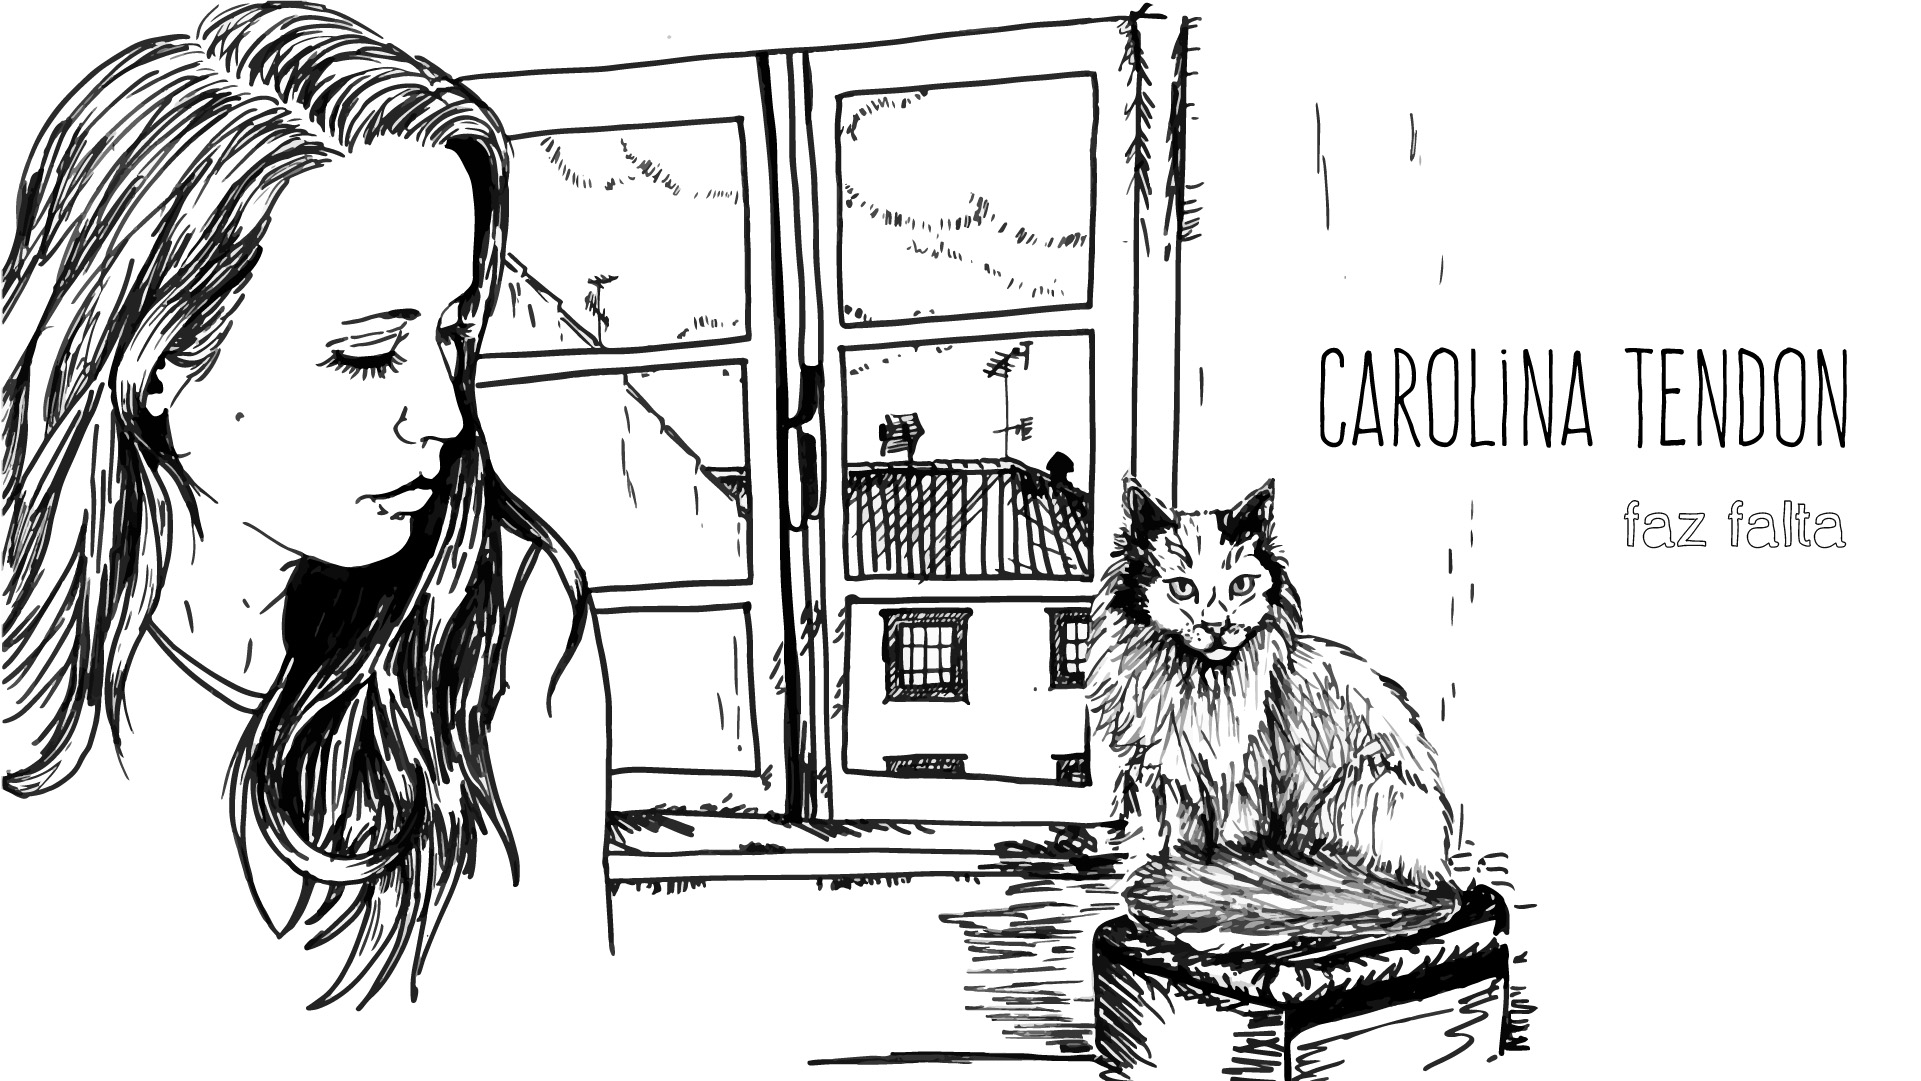 Carolina Tendon - Faz falta (por Reflect)